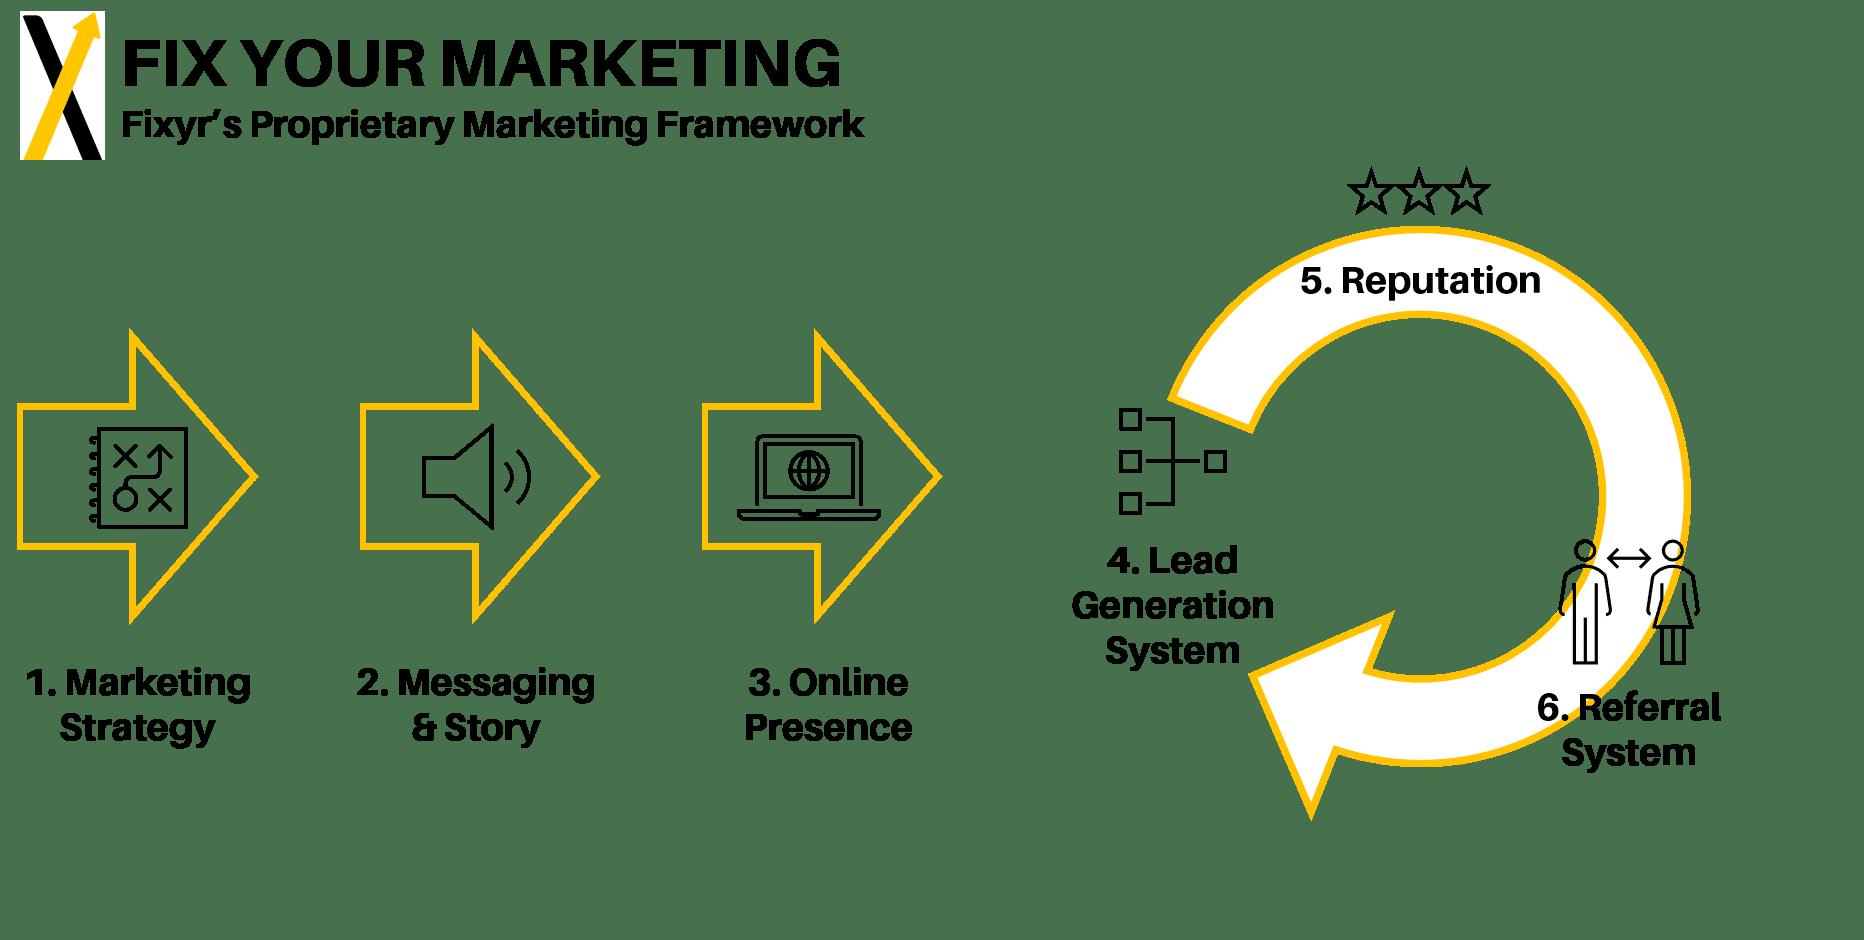 Fixyr's Marketing Framework